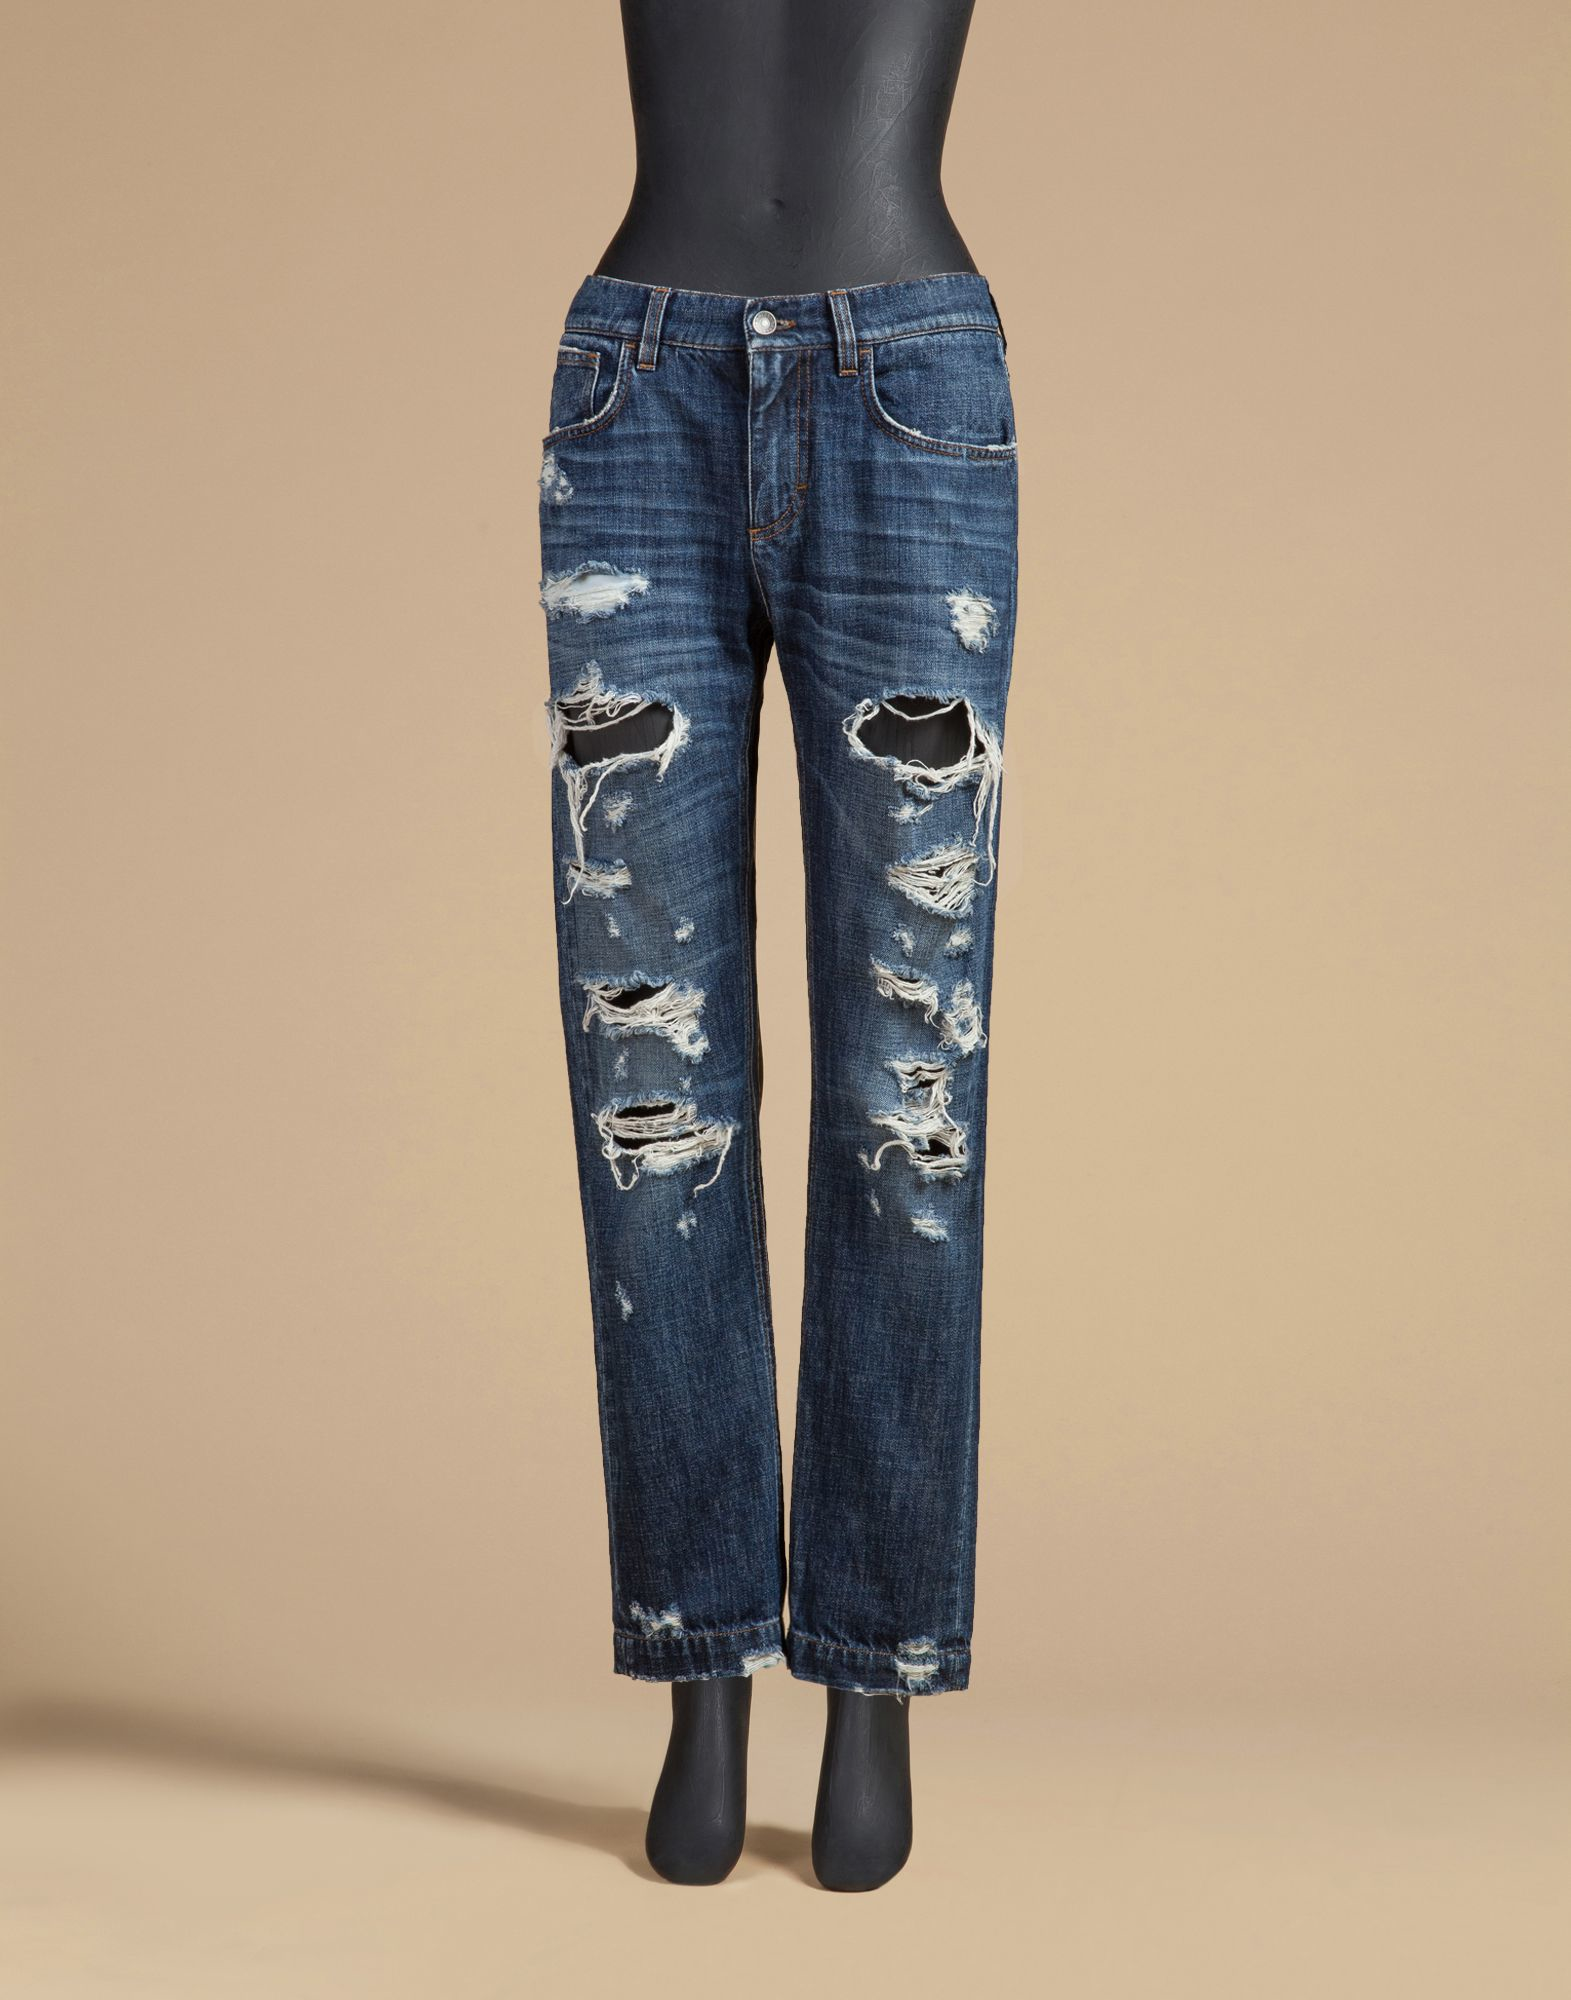 Dolce & gabbana Boyfriend Fit Jeans In Non Stretch Denim With ...